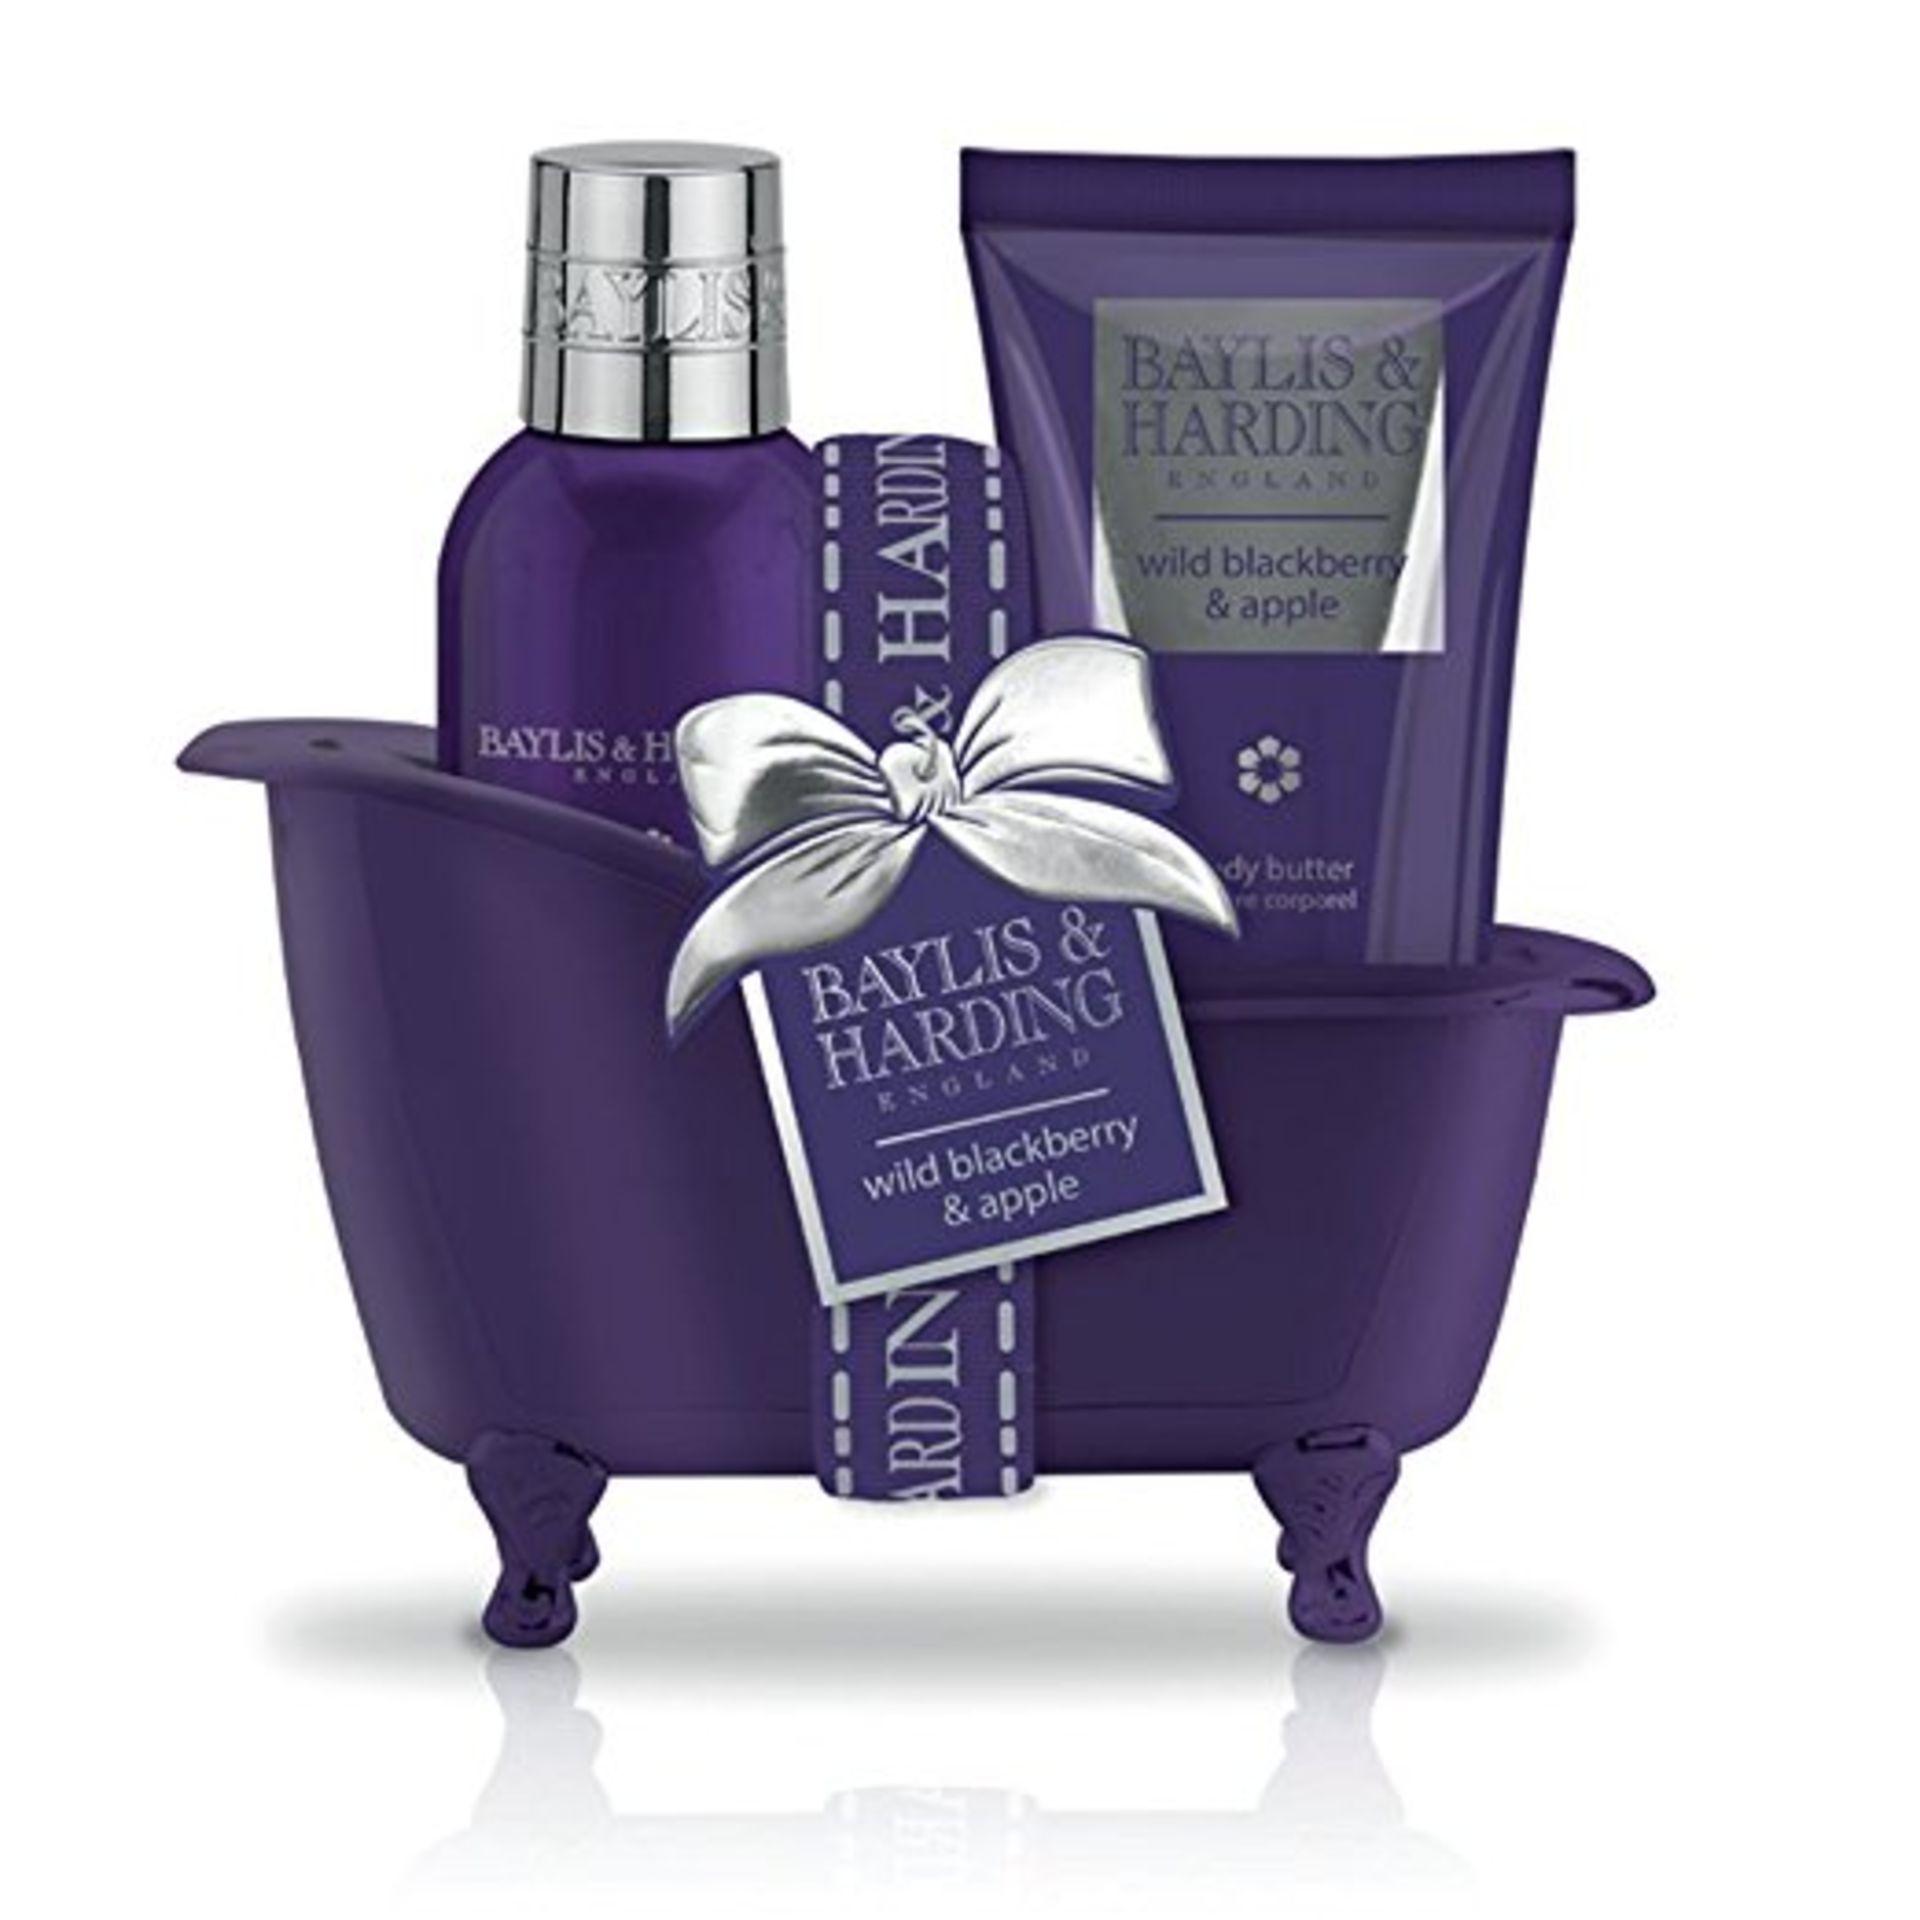 + VAT Brand New Baylis & Harding Wild Blackberry & Apple Bath Set - Image 2 of 2